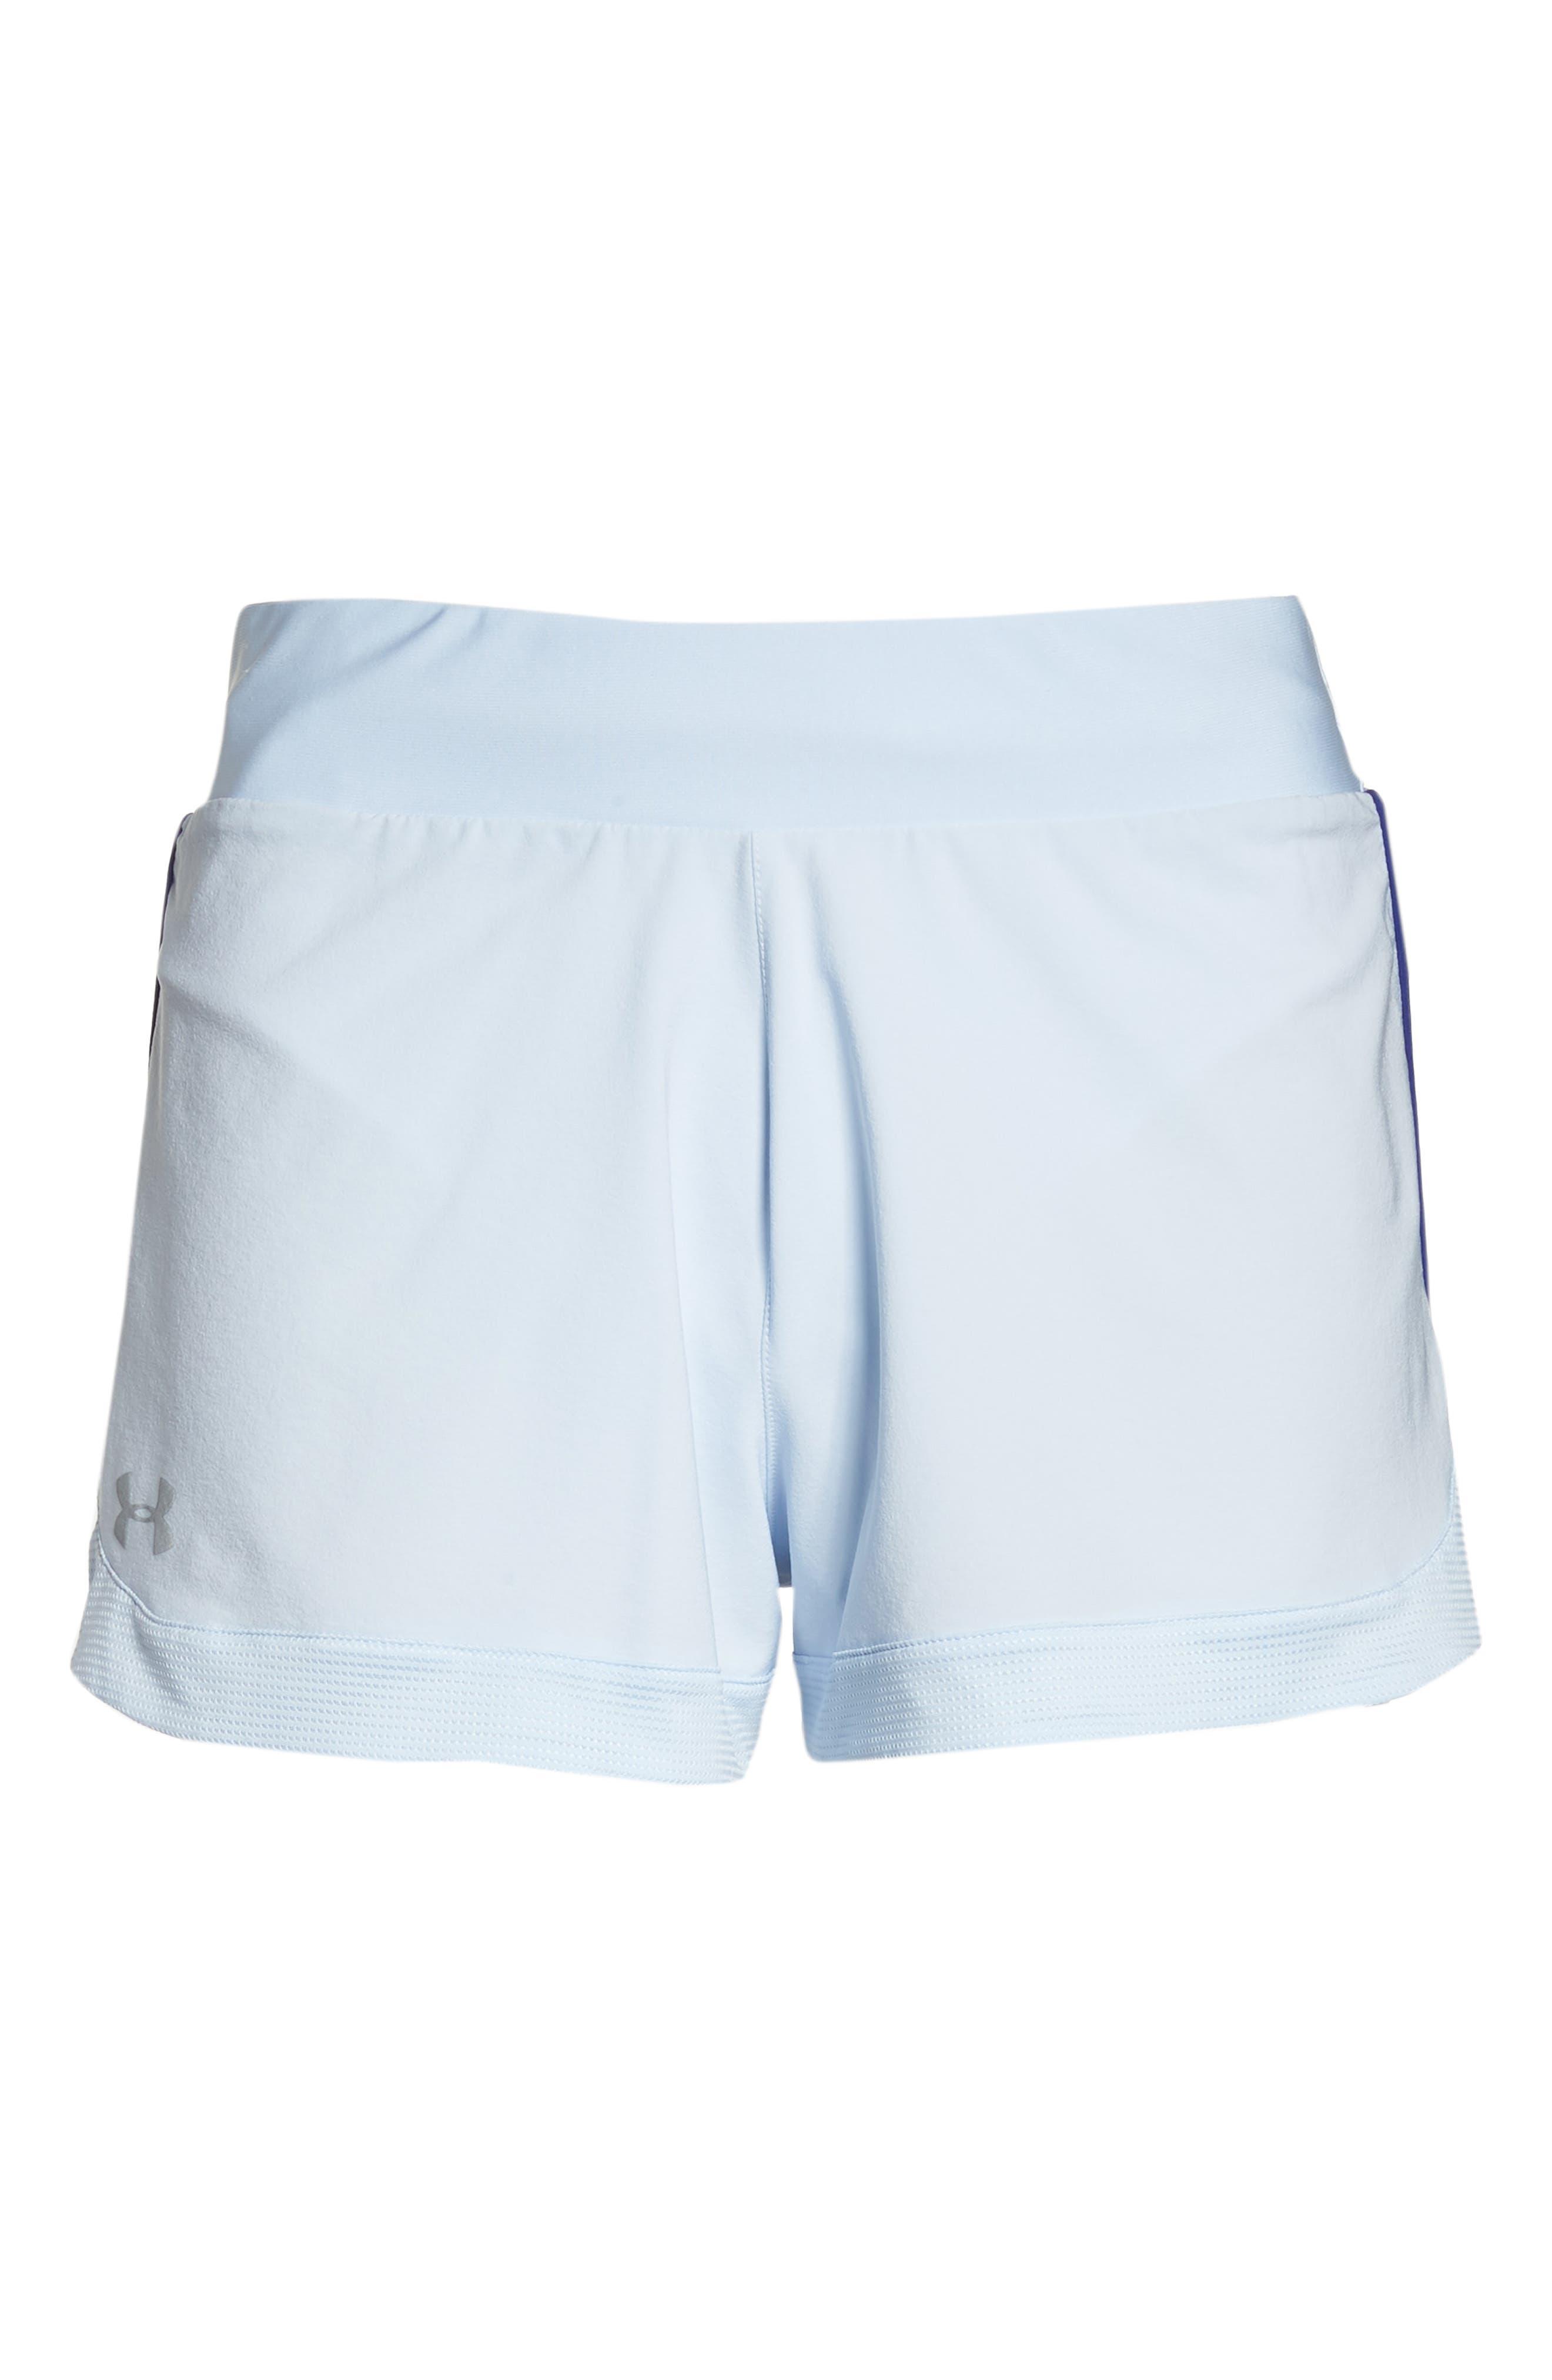 Speedpocket Shorts,                             Alternate thumbnail 7, color,                             Oxford Blue